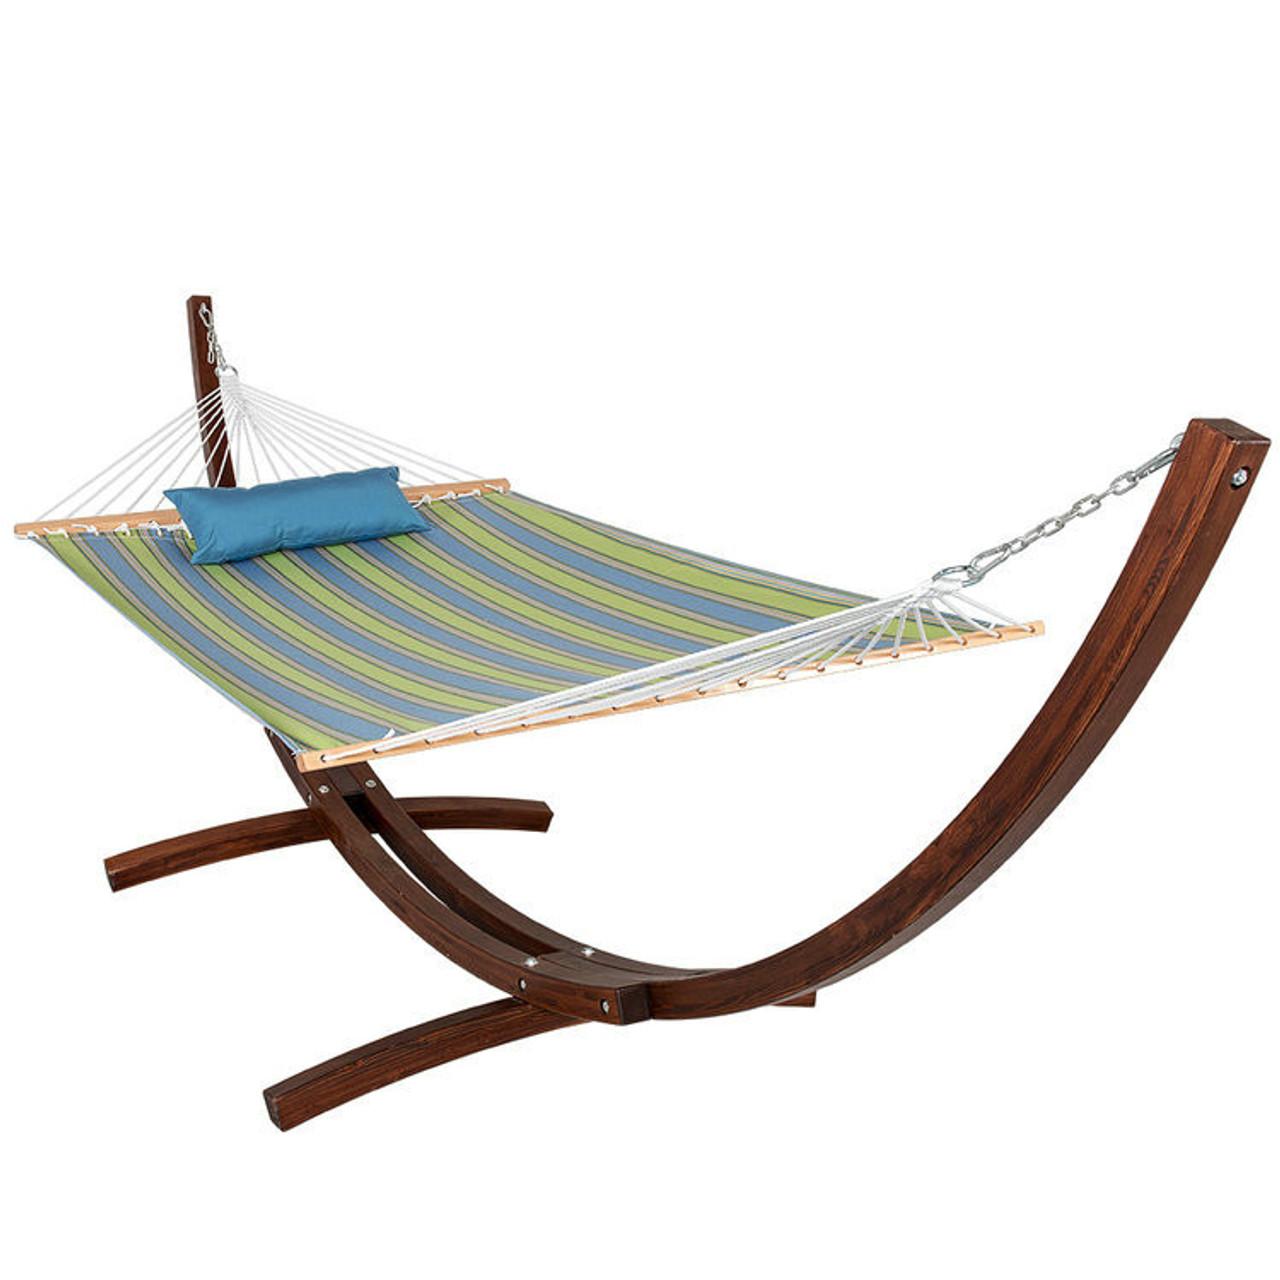 sunbrella fabric hammock pillow and 12 feet wood arc stand backyard  bo set 12 ft  wood arc hammock stand with 2 person double layer polyester      rh   sundaleoutdoor